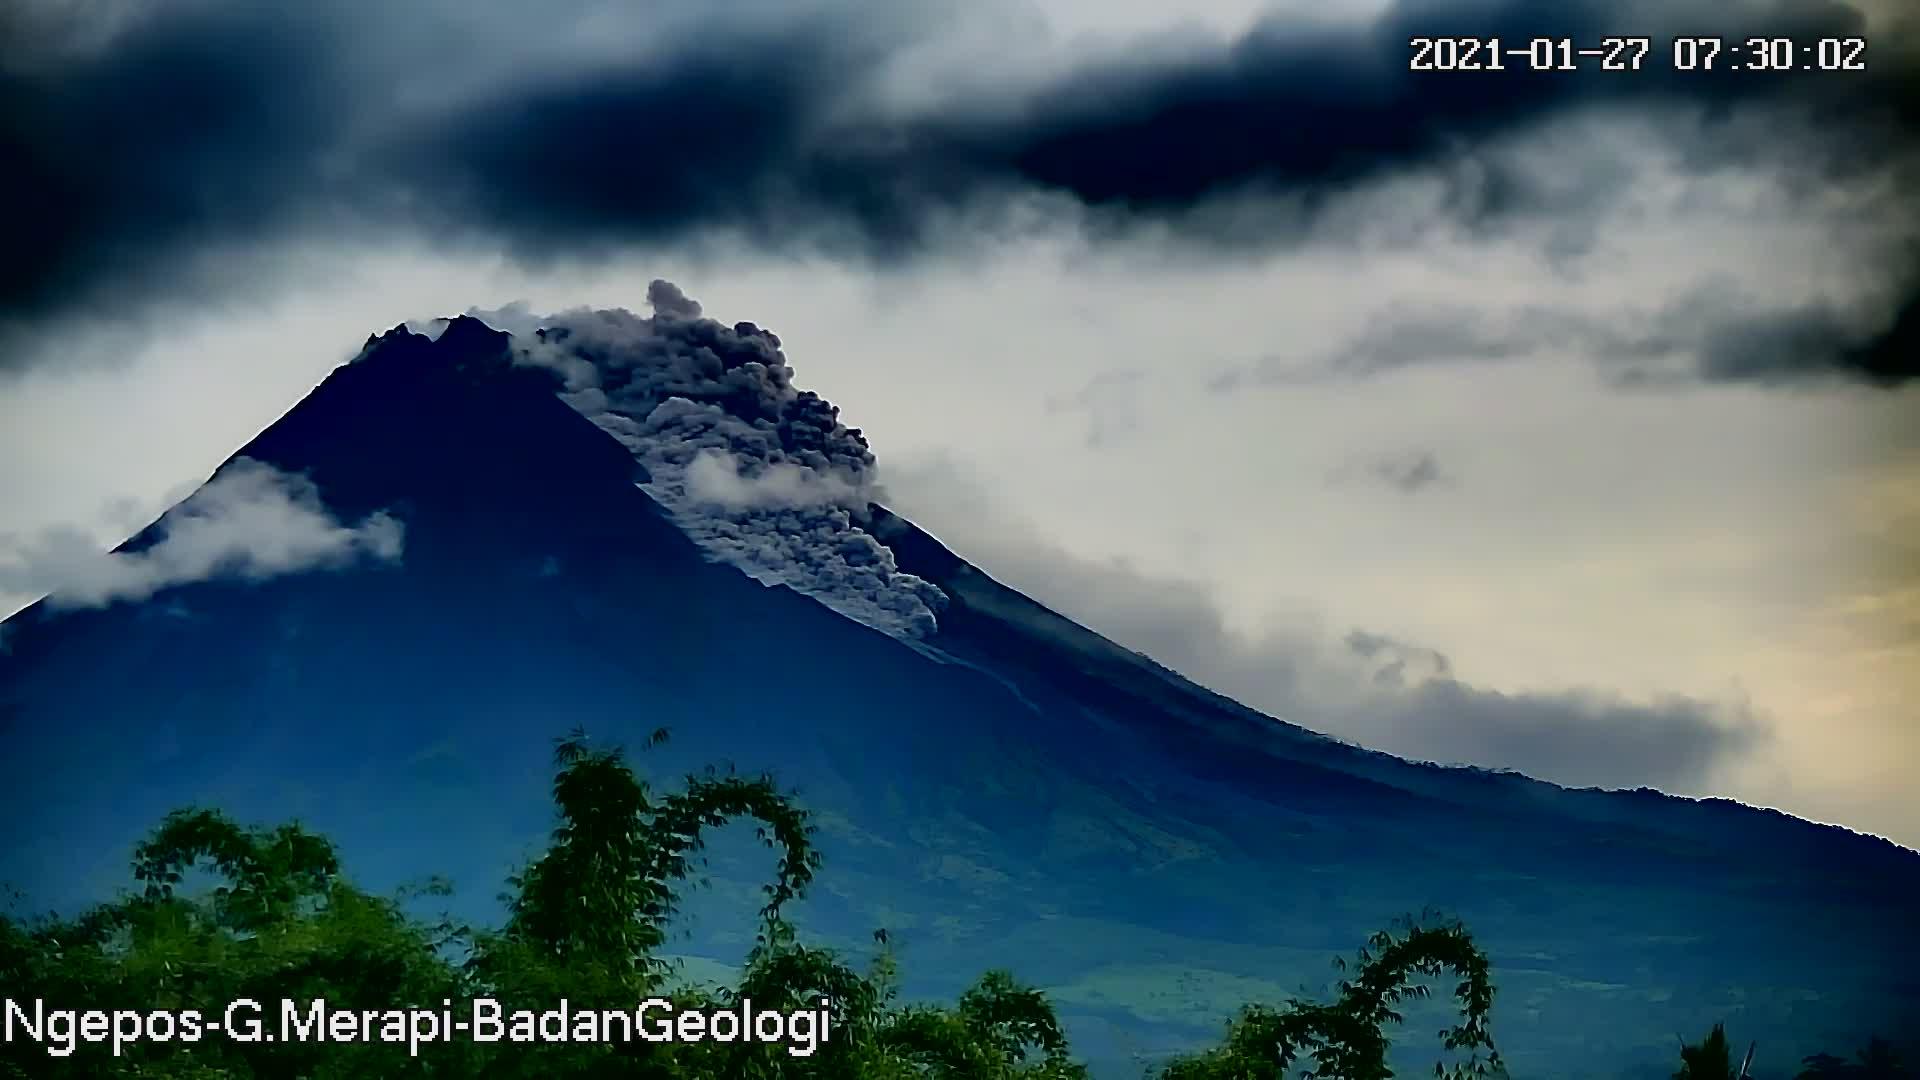 awan panas guguran Merapi tercatat di seismogram dengan amplitudo 50 mm dan durasi 139 detik, tinggi kolom tersapu angin ke lereng arah timur, estimasi jarak luncur 1300 m ke arah barat daya: hulu Kali Krasak dan Boyong. Foto: BPPTKG